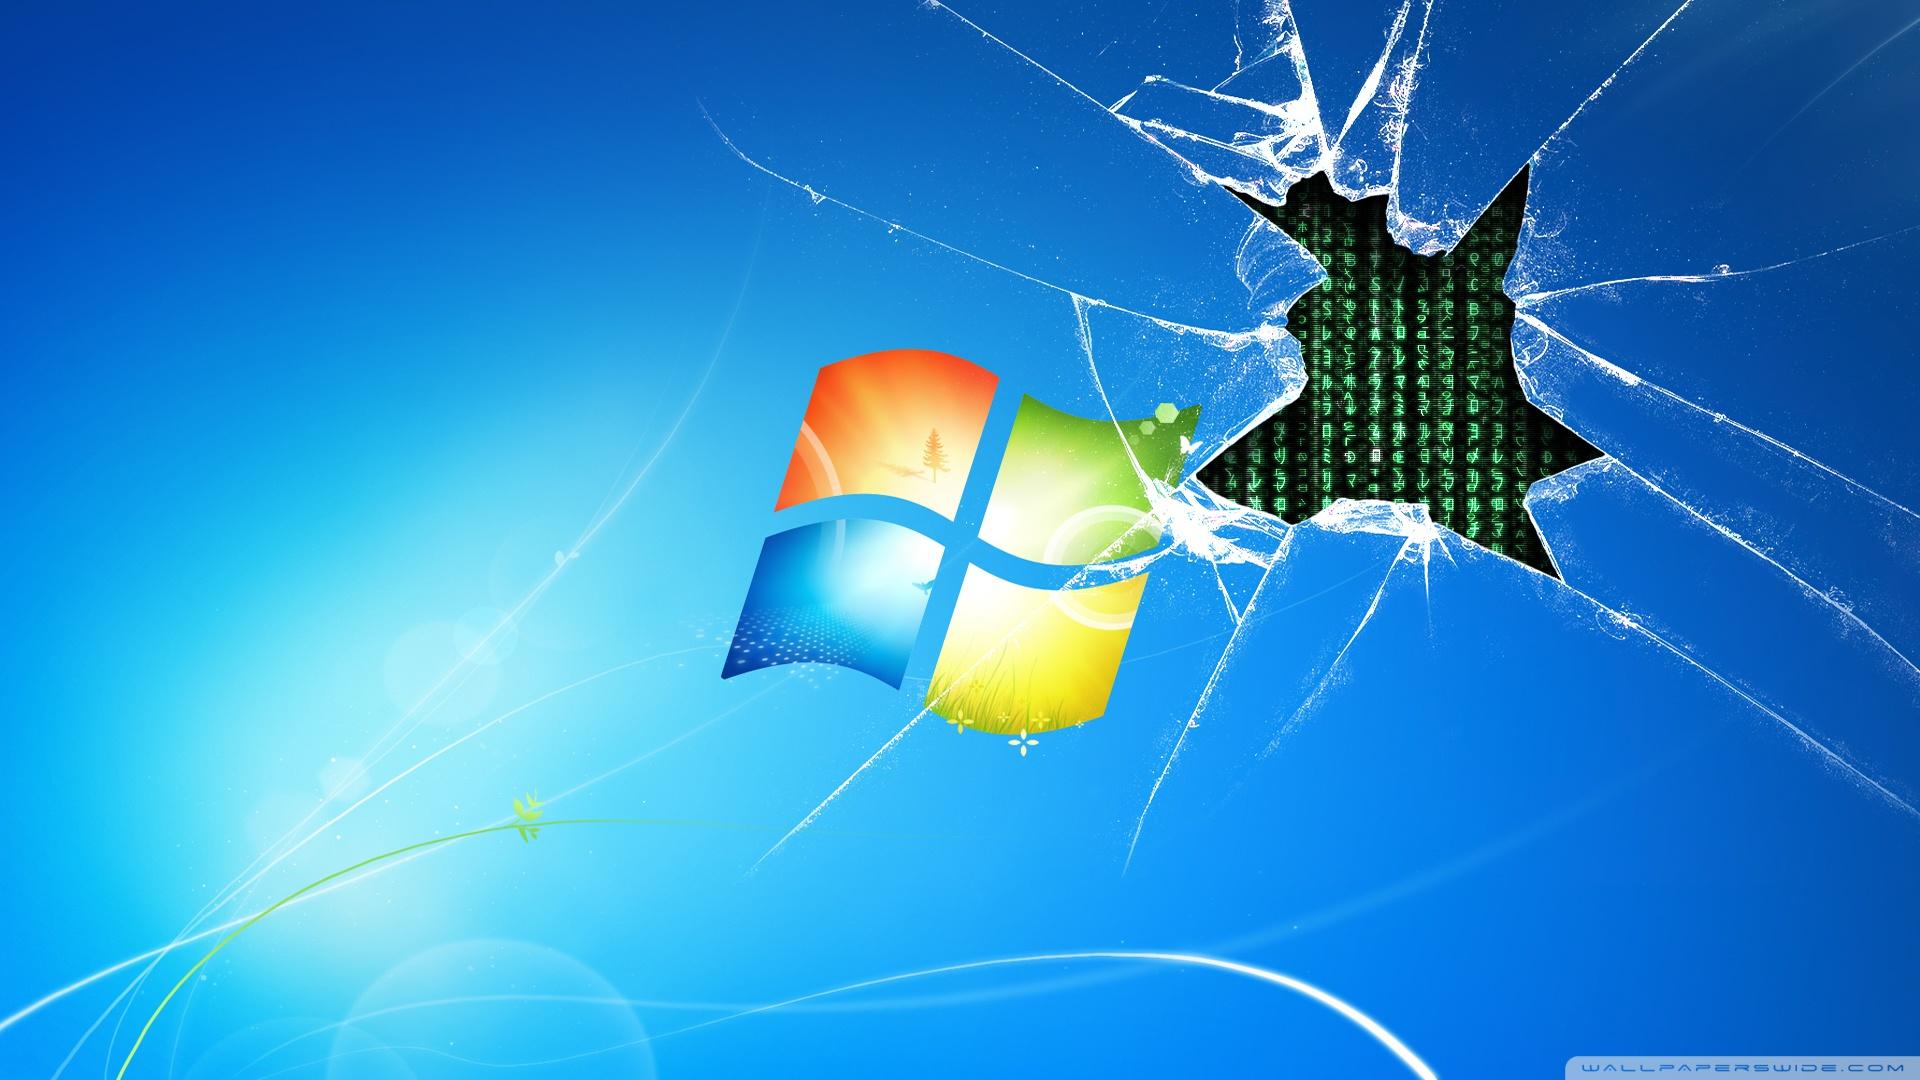 matrix_got_windows_7-wallpaper-1920x1080